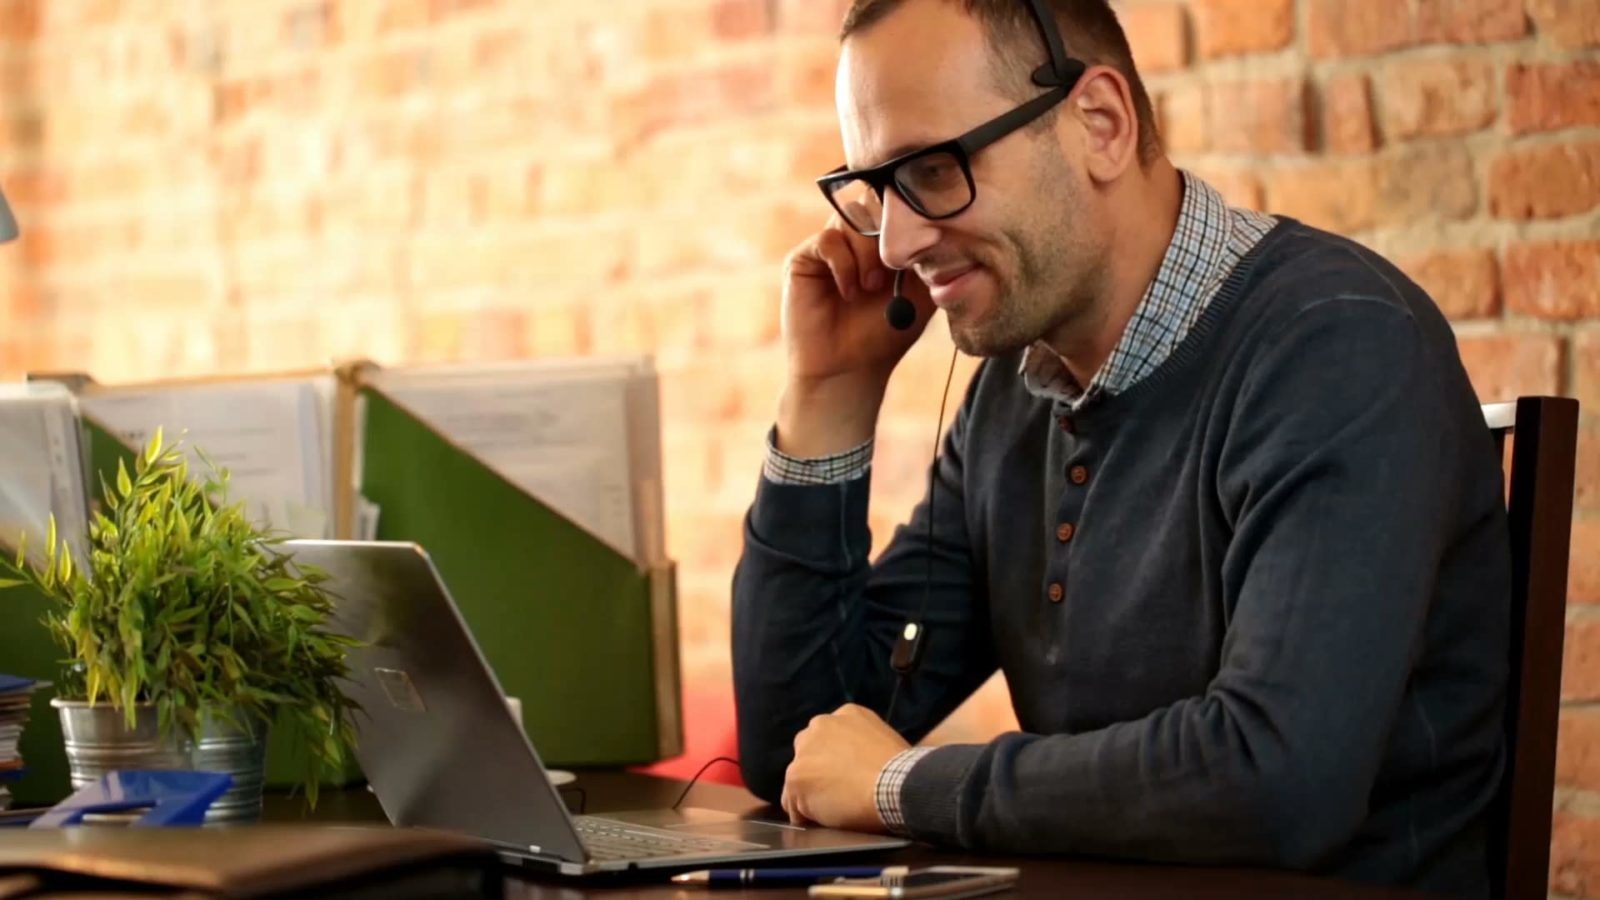 Sirope-Historias-Articulos opinion-web rentable-comunicar clientes